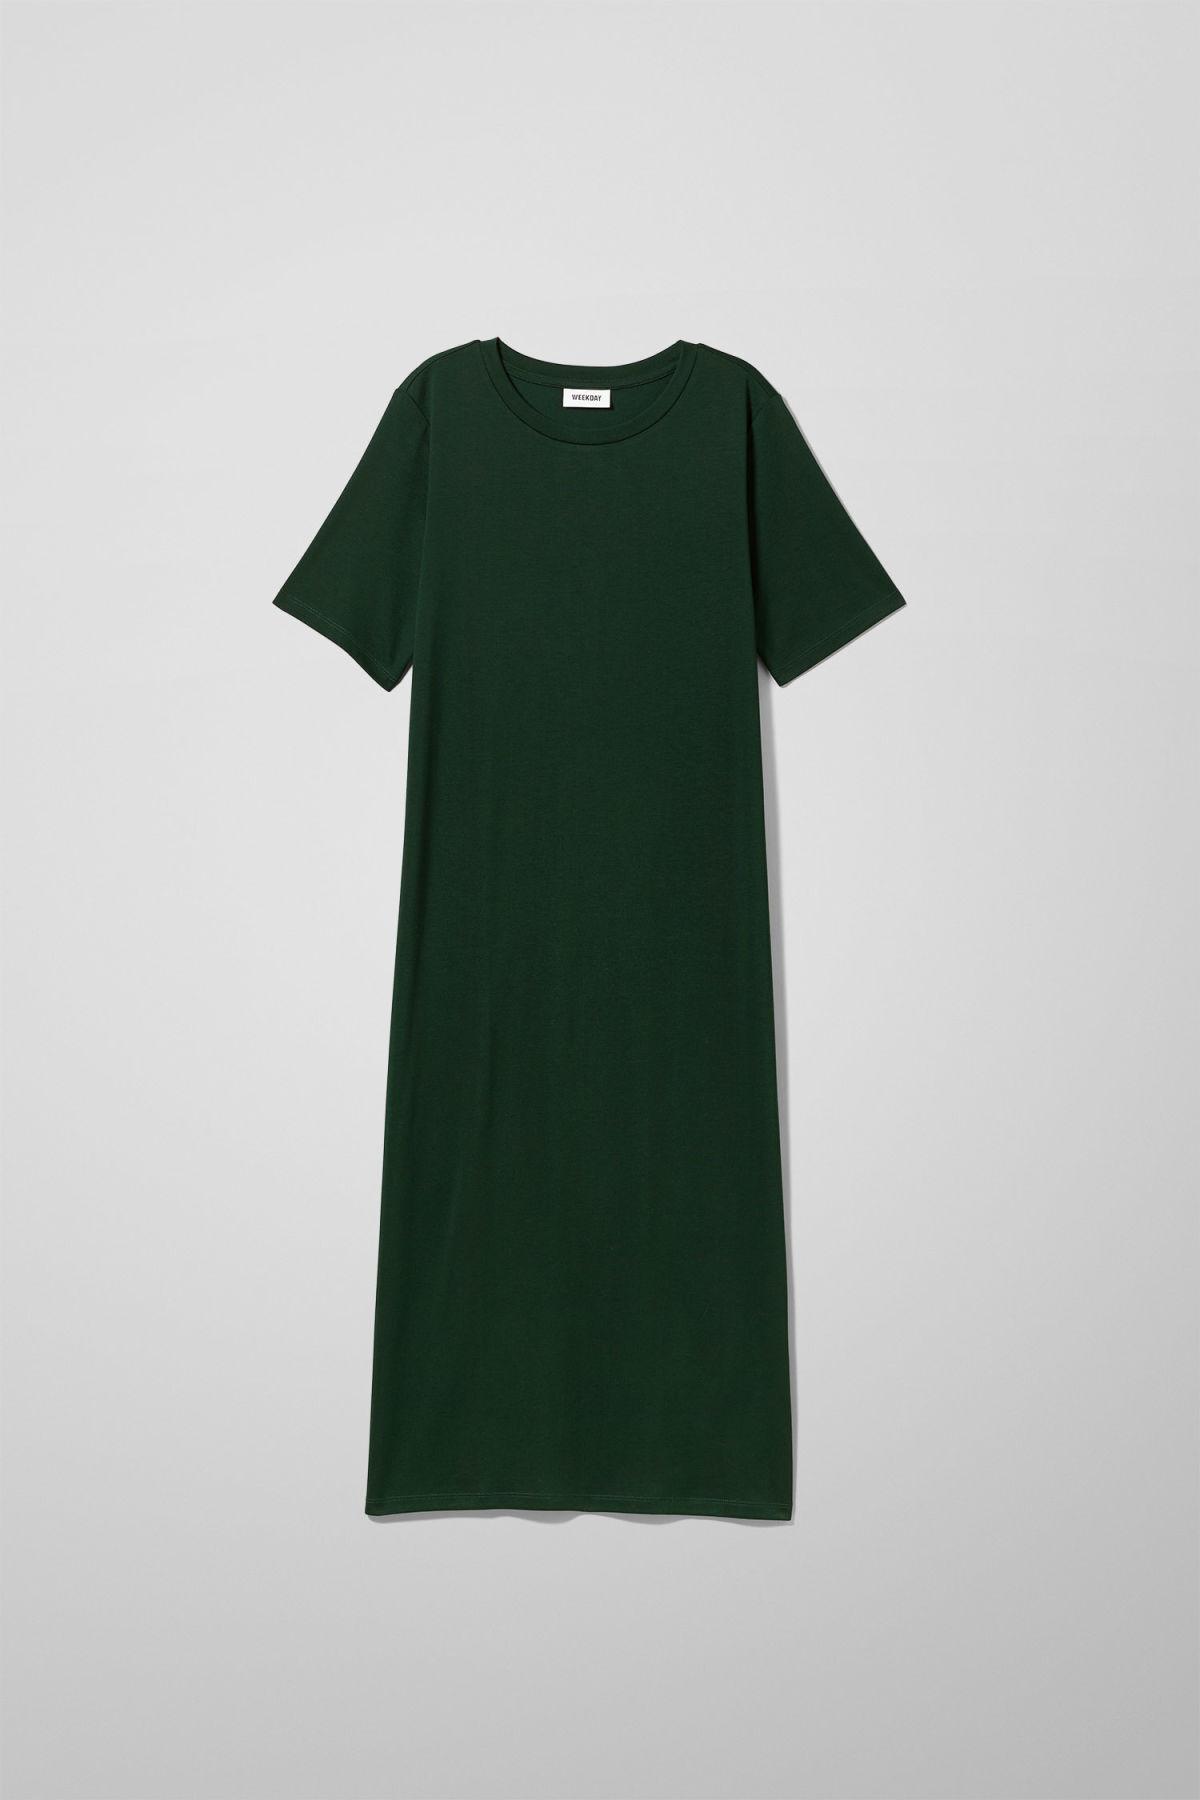 Image of Beyond Dress - Green-XS